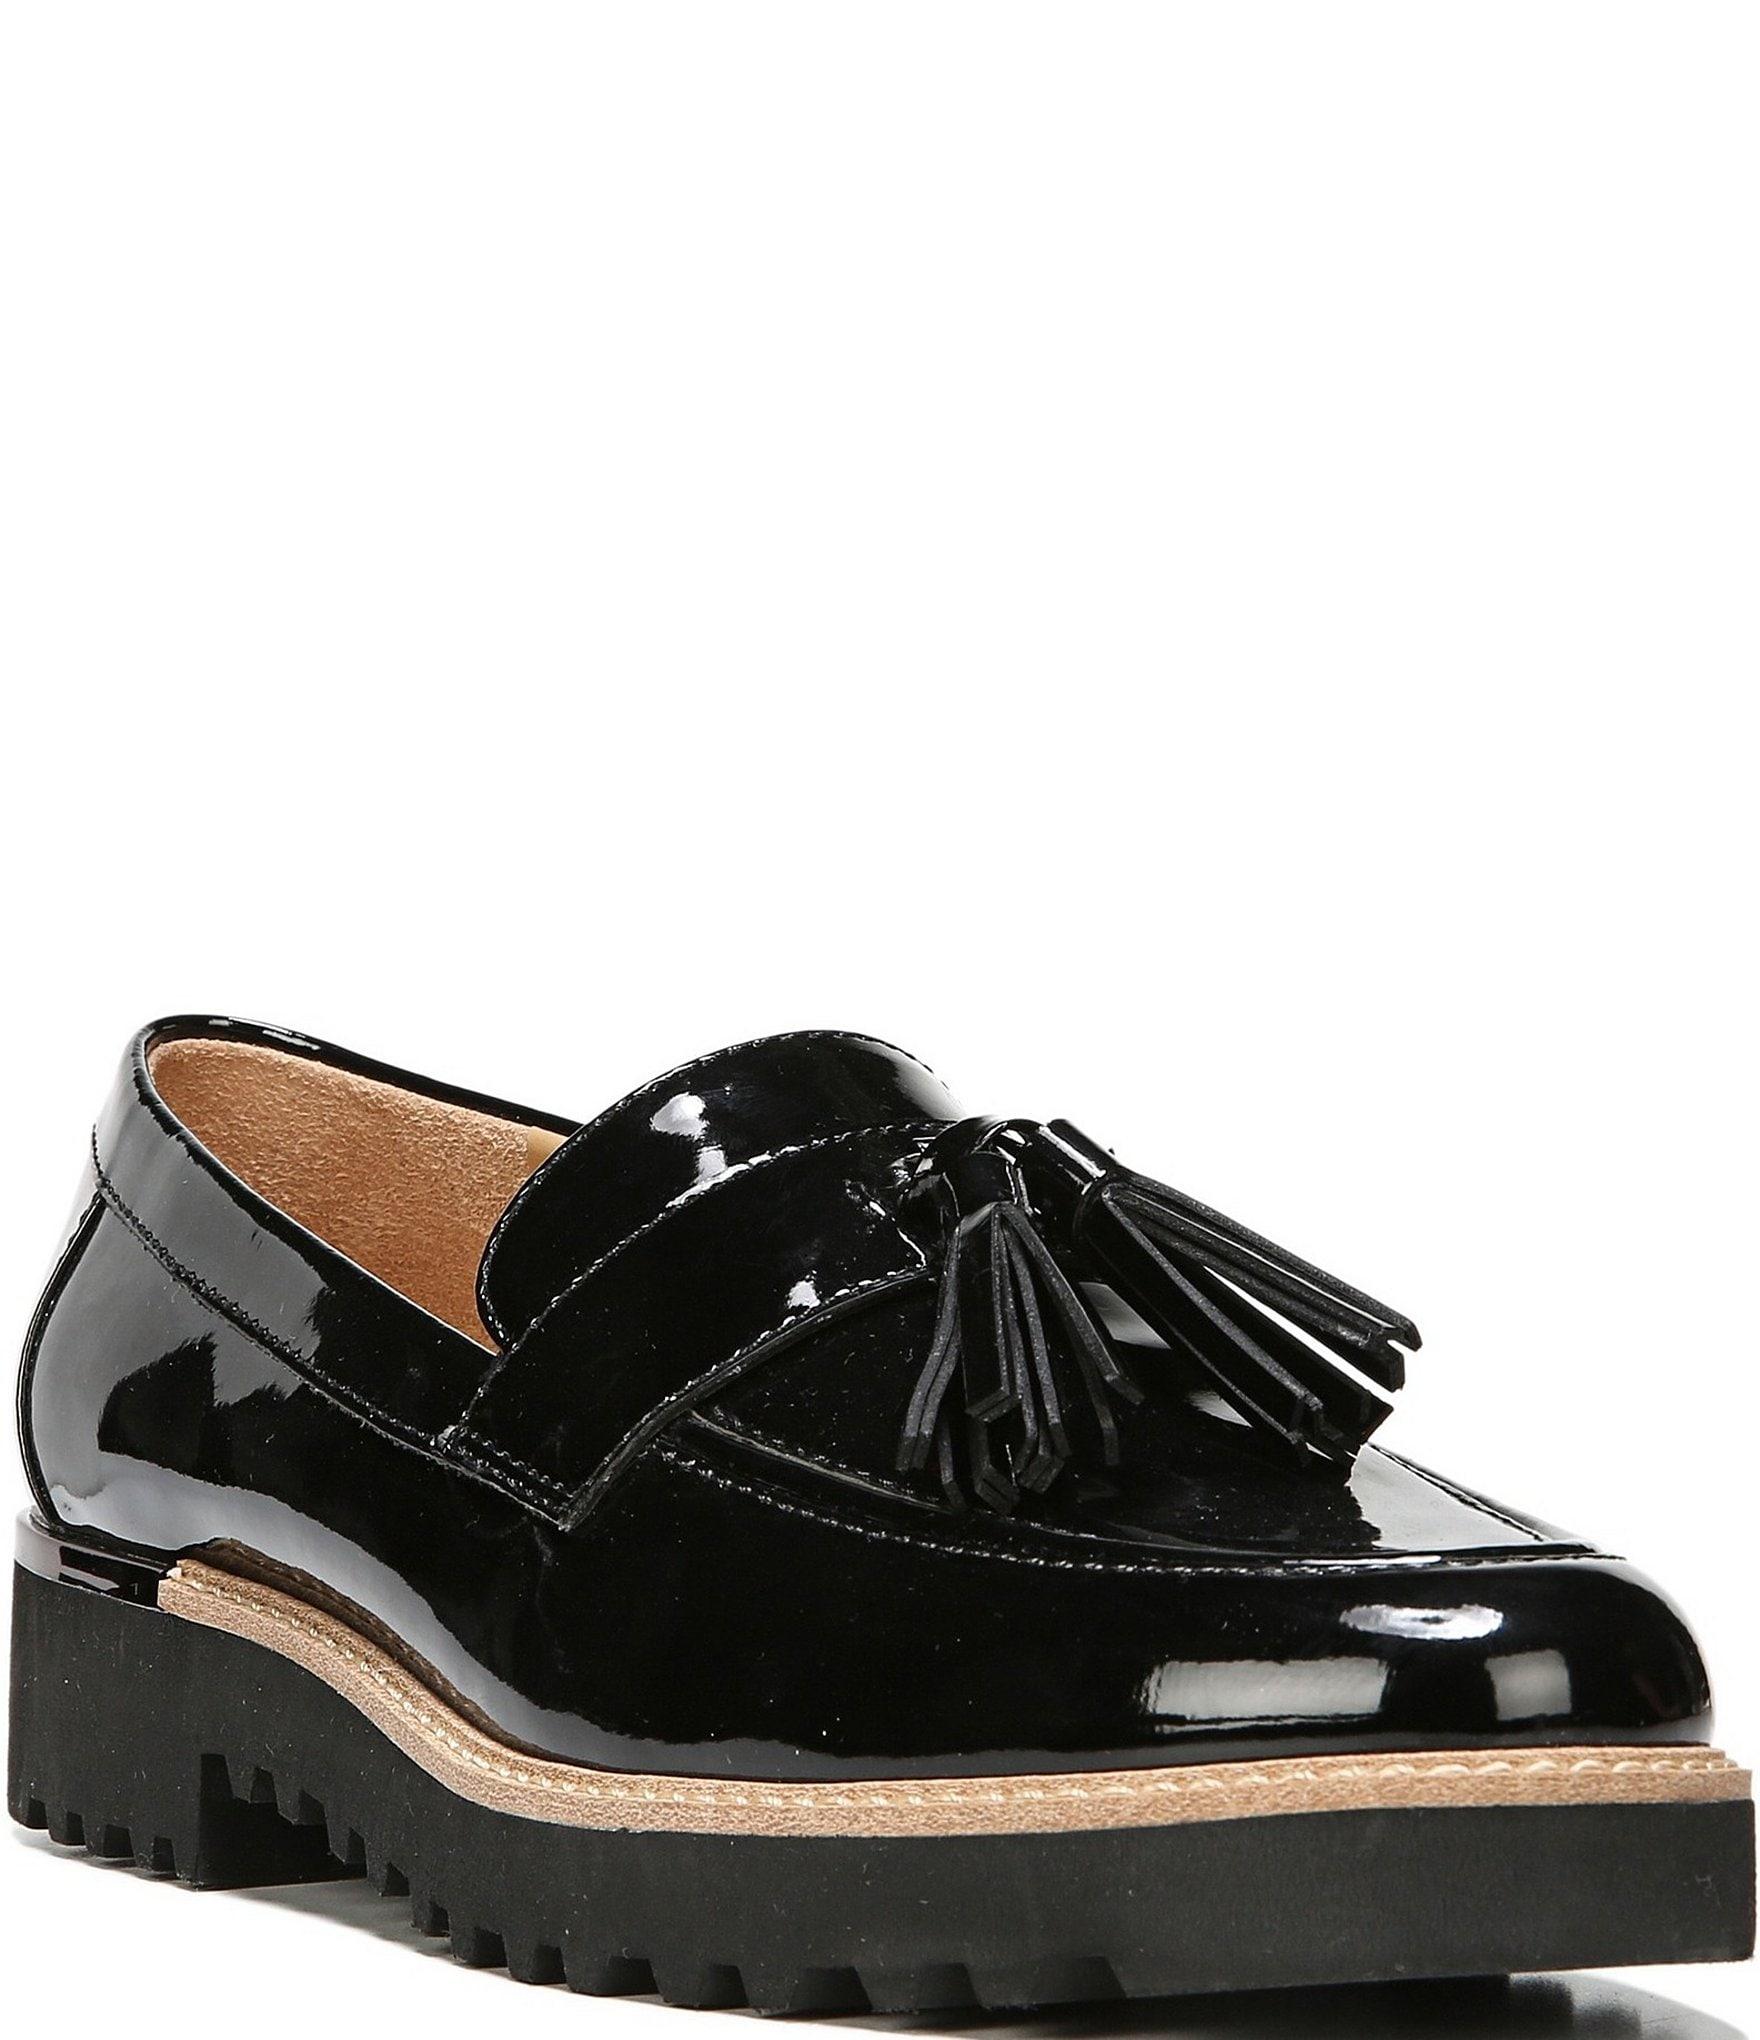 50cfc5b2ff7 Franco Sarto Carolynn Patent Tassel Block Heel Loafers